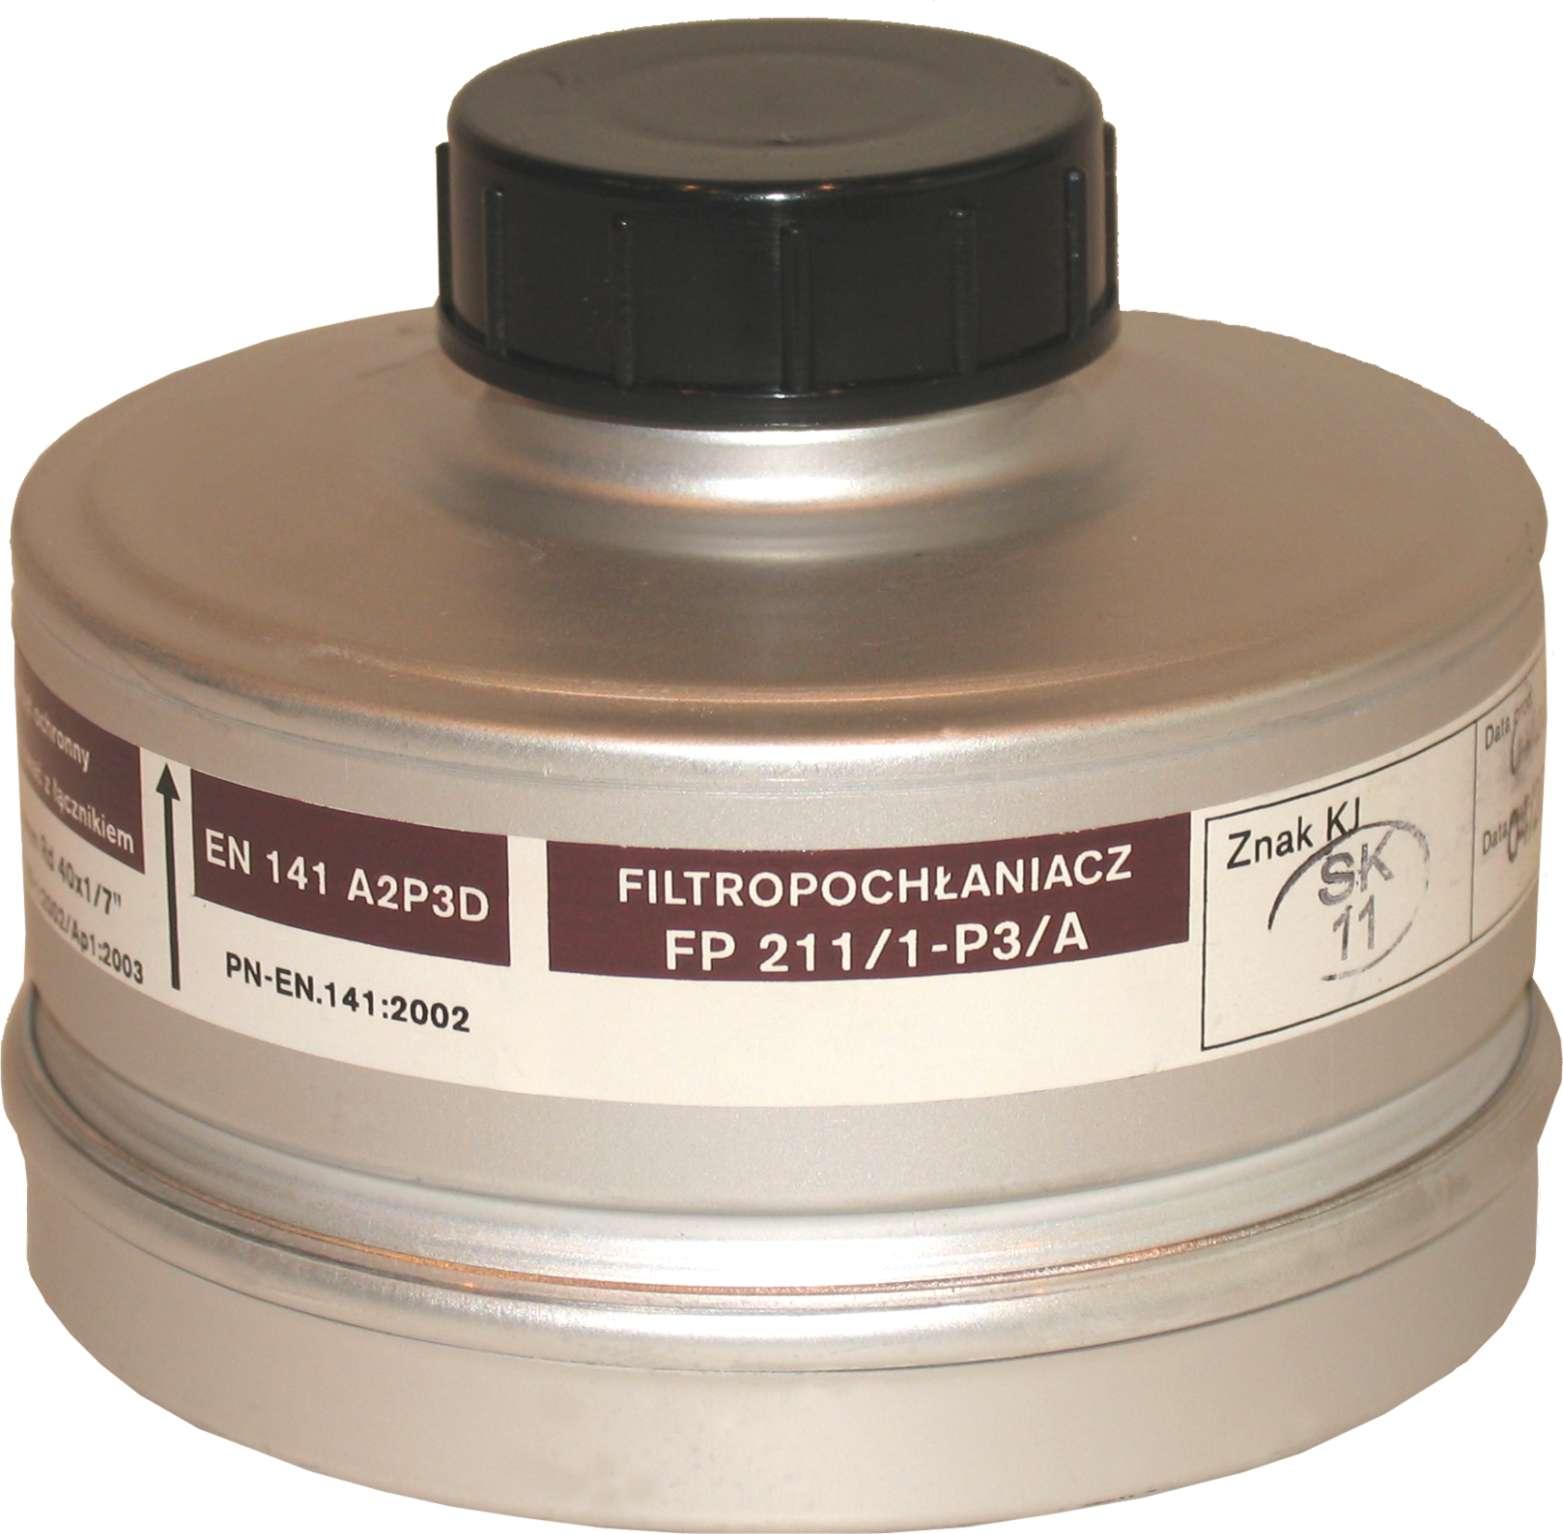 Filtropochłaniacz FP 211/1-P3/A